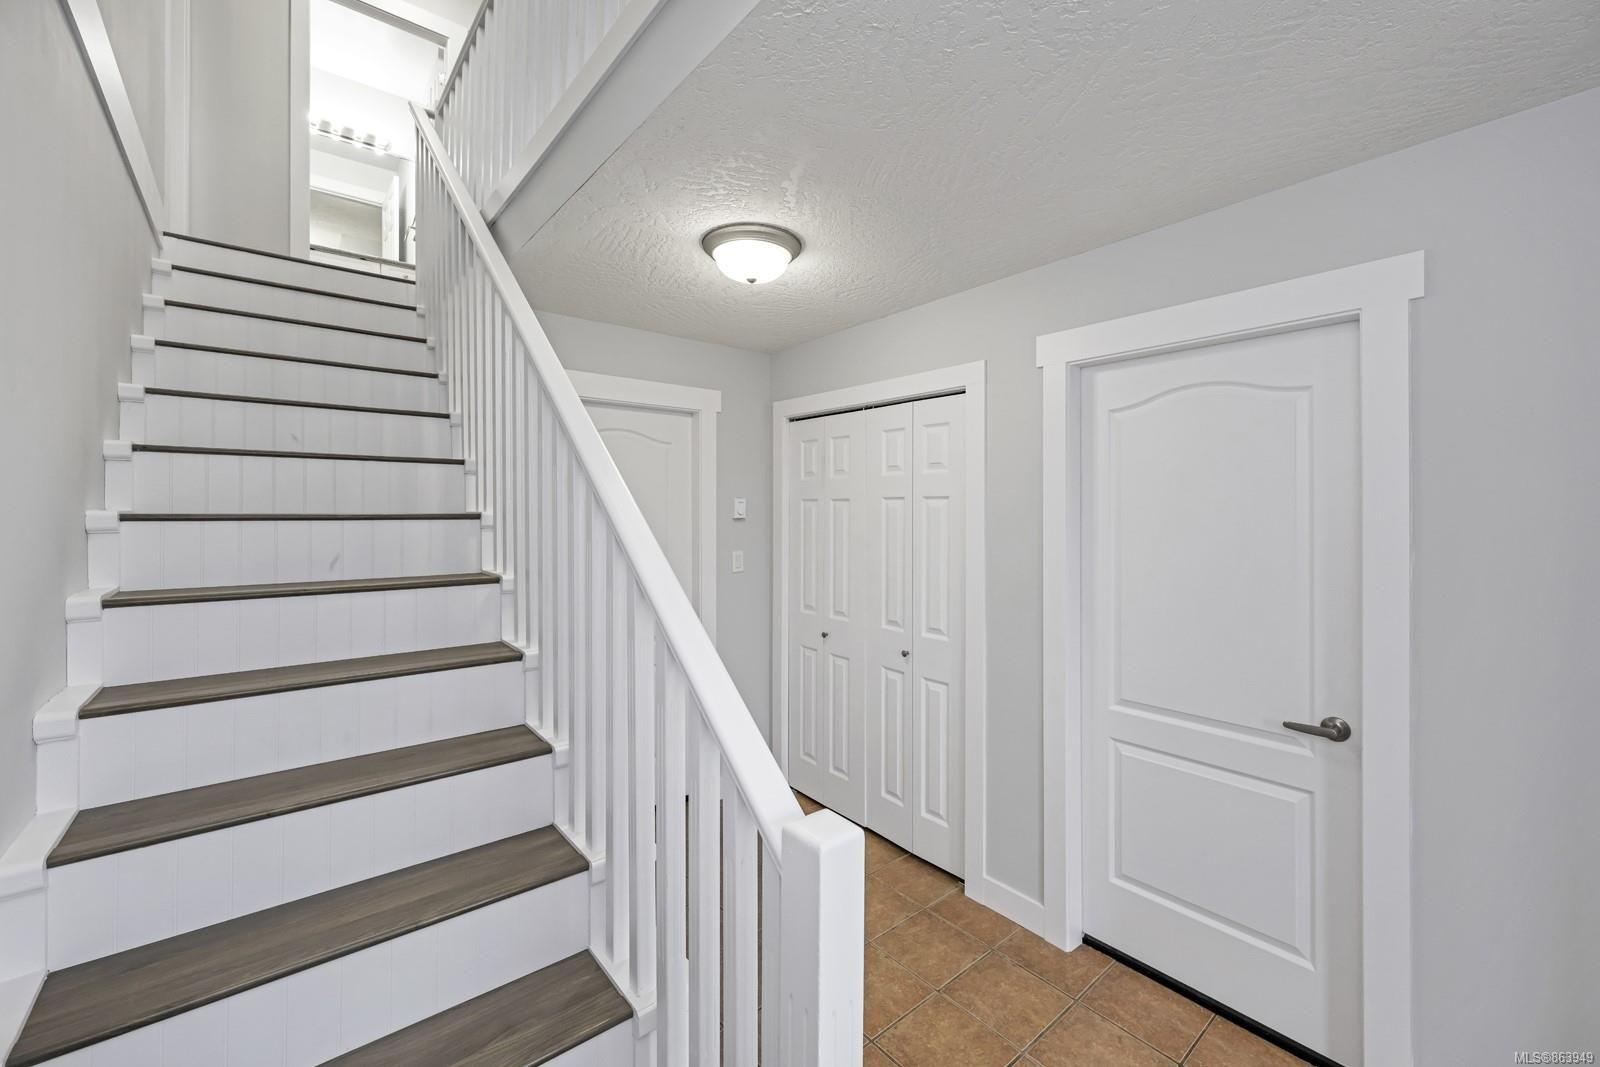 Photo 3: Photos: 6154 Sayward Rd in : Du West Duncan Half Duplex for sale (Duncan)  : MLS®# 863949